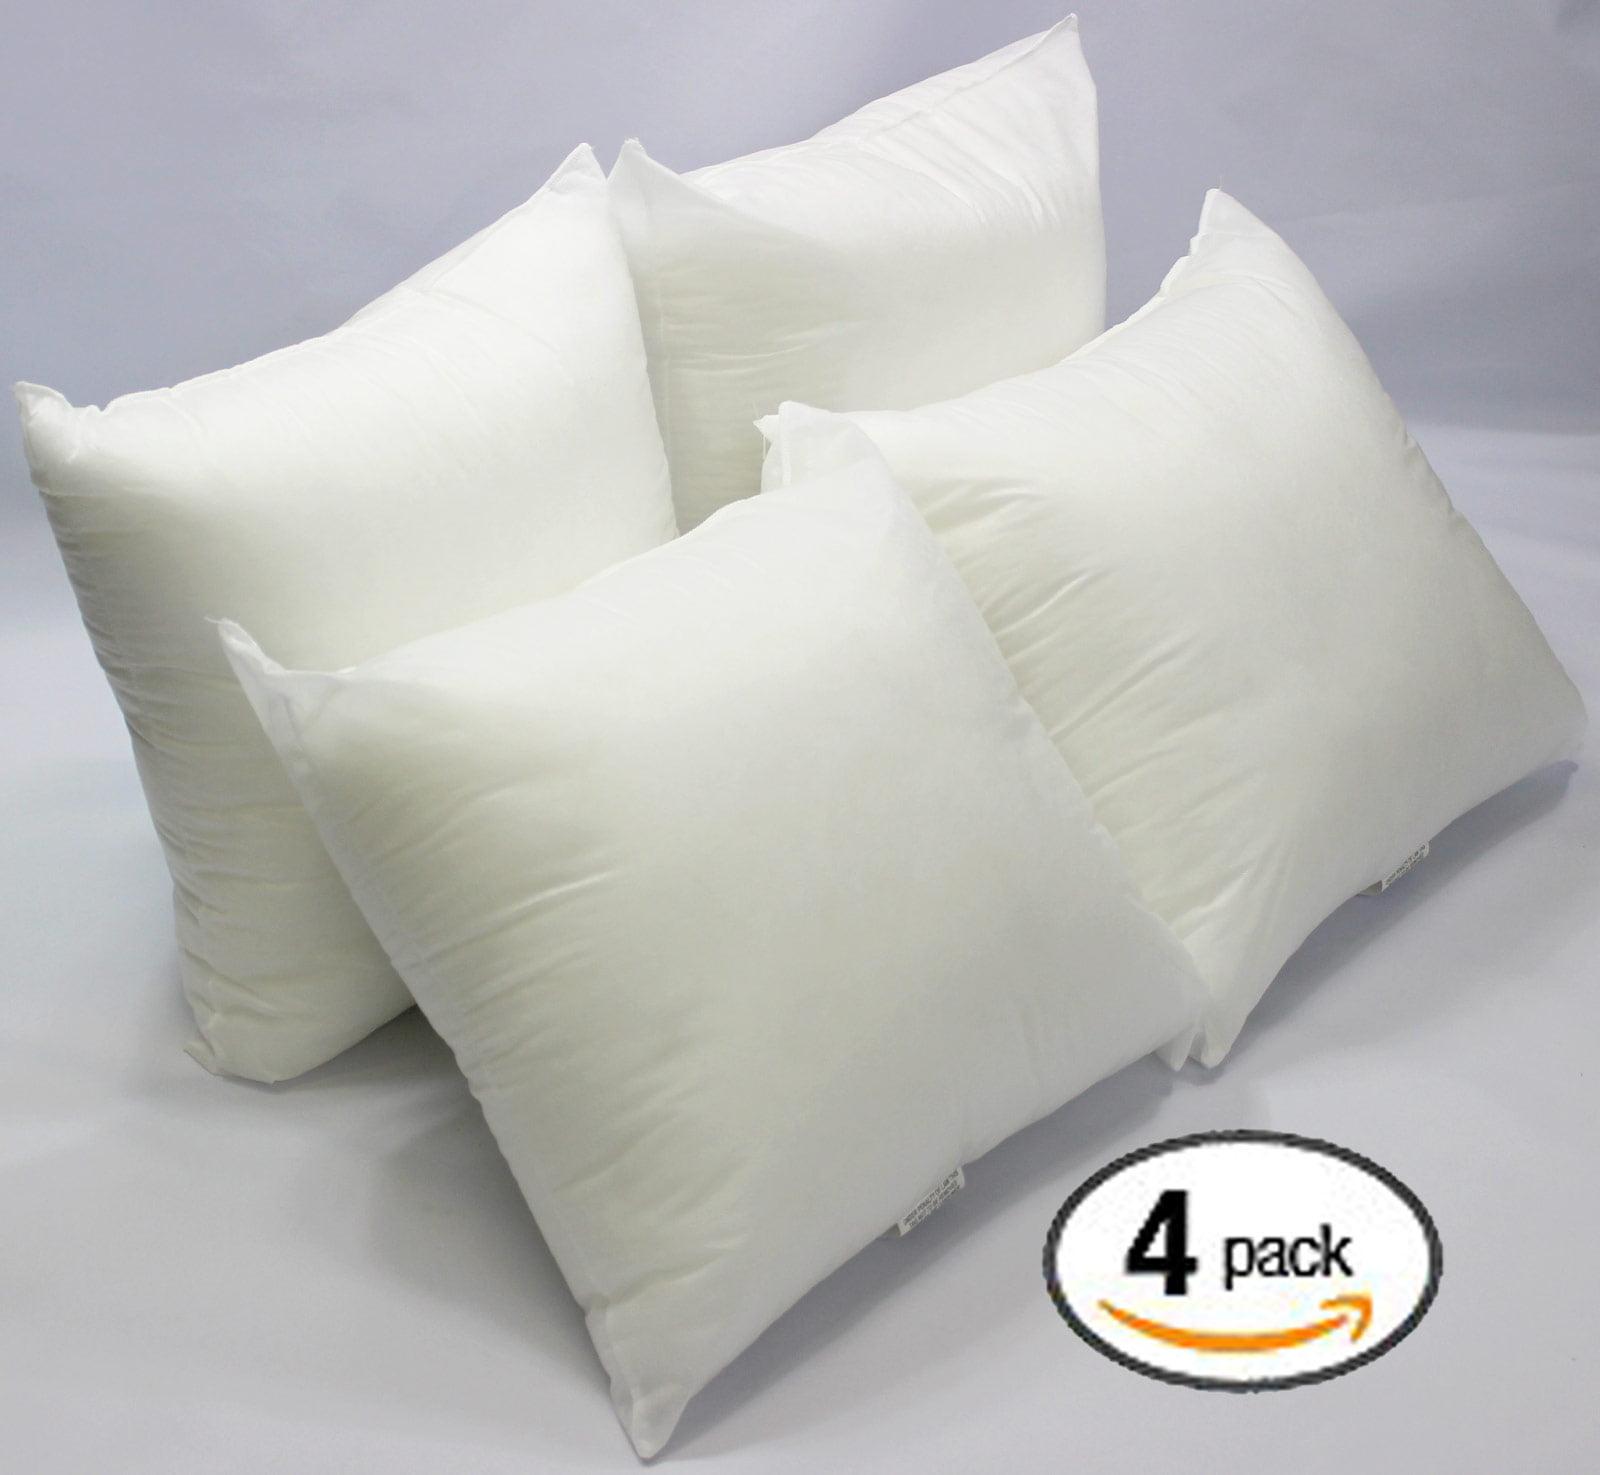 Set of 2-20 x 20 Premium Hypoallergenic Stuffer Pillow Insert Sham Square Form